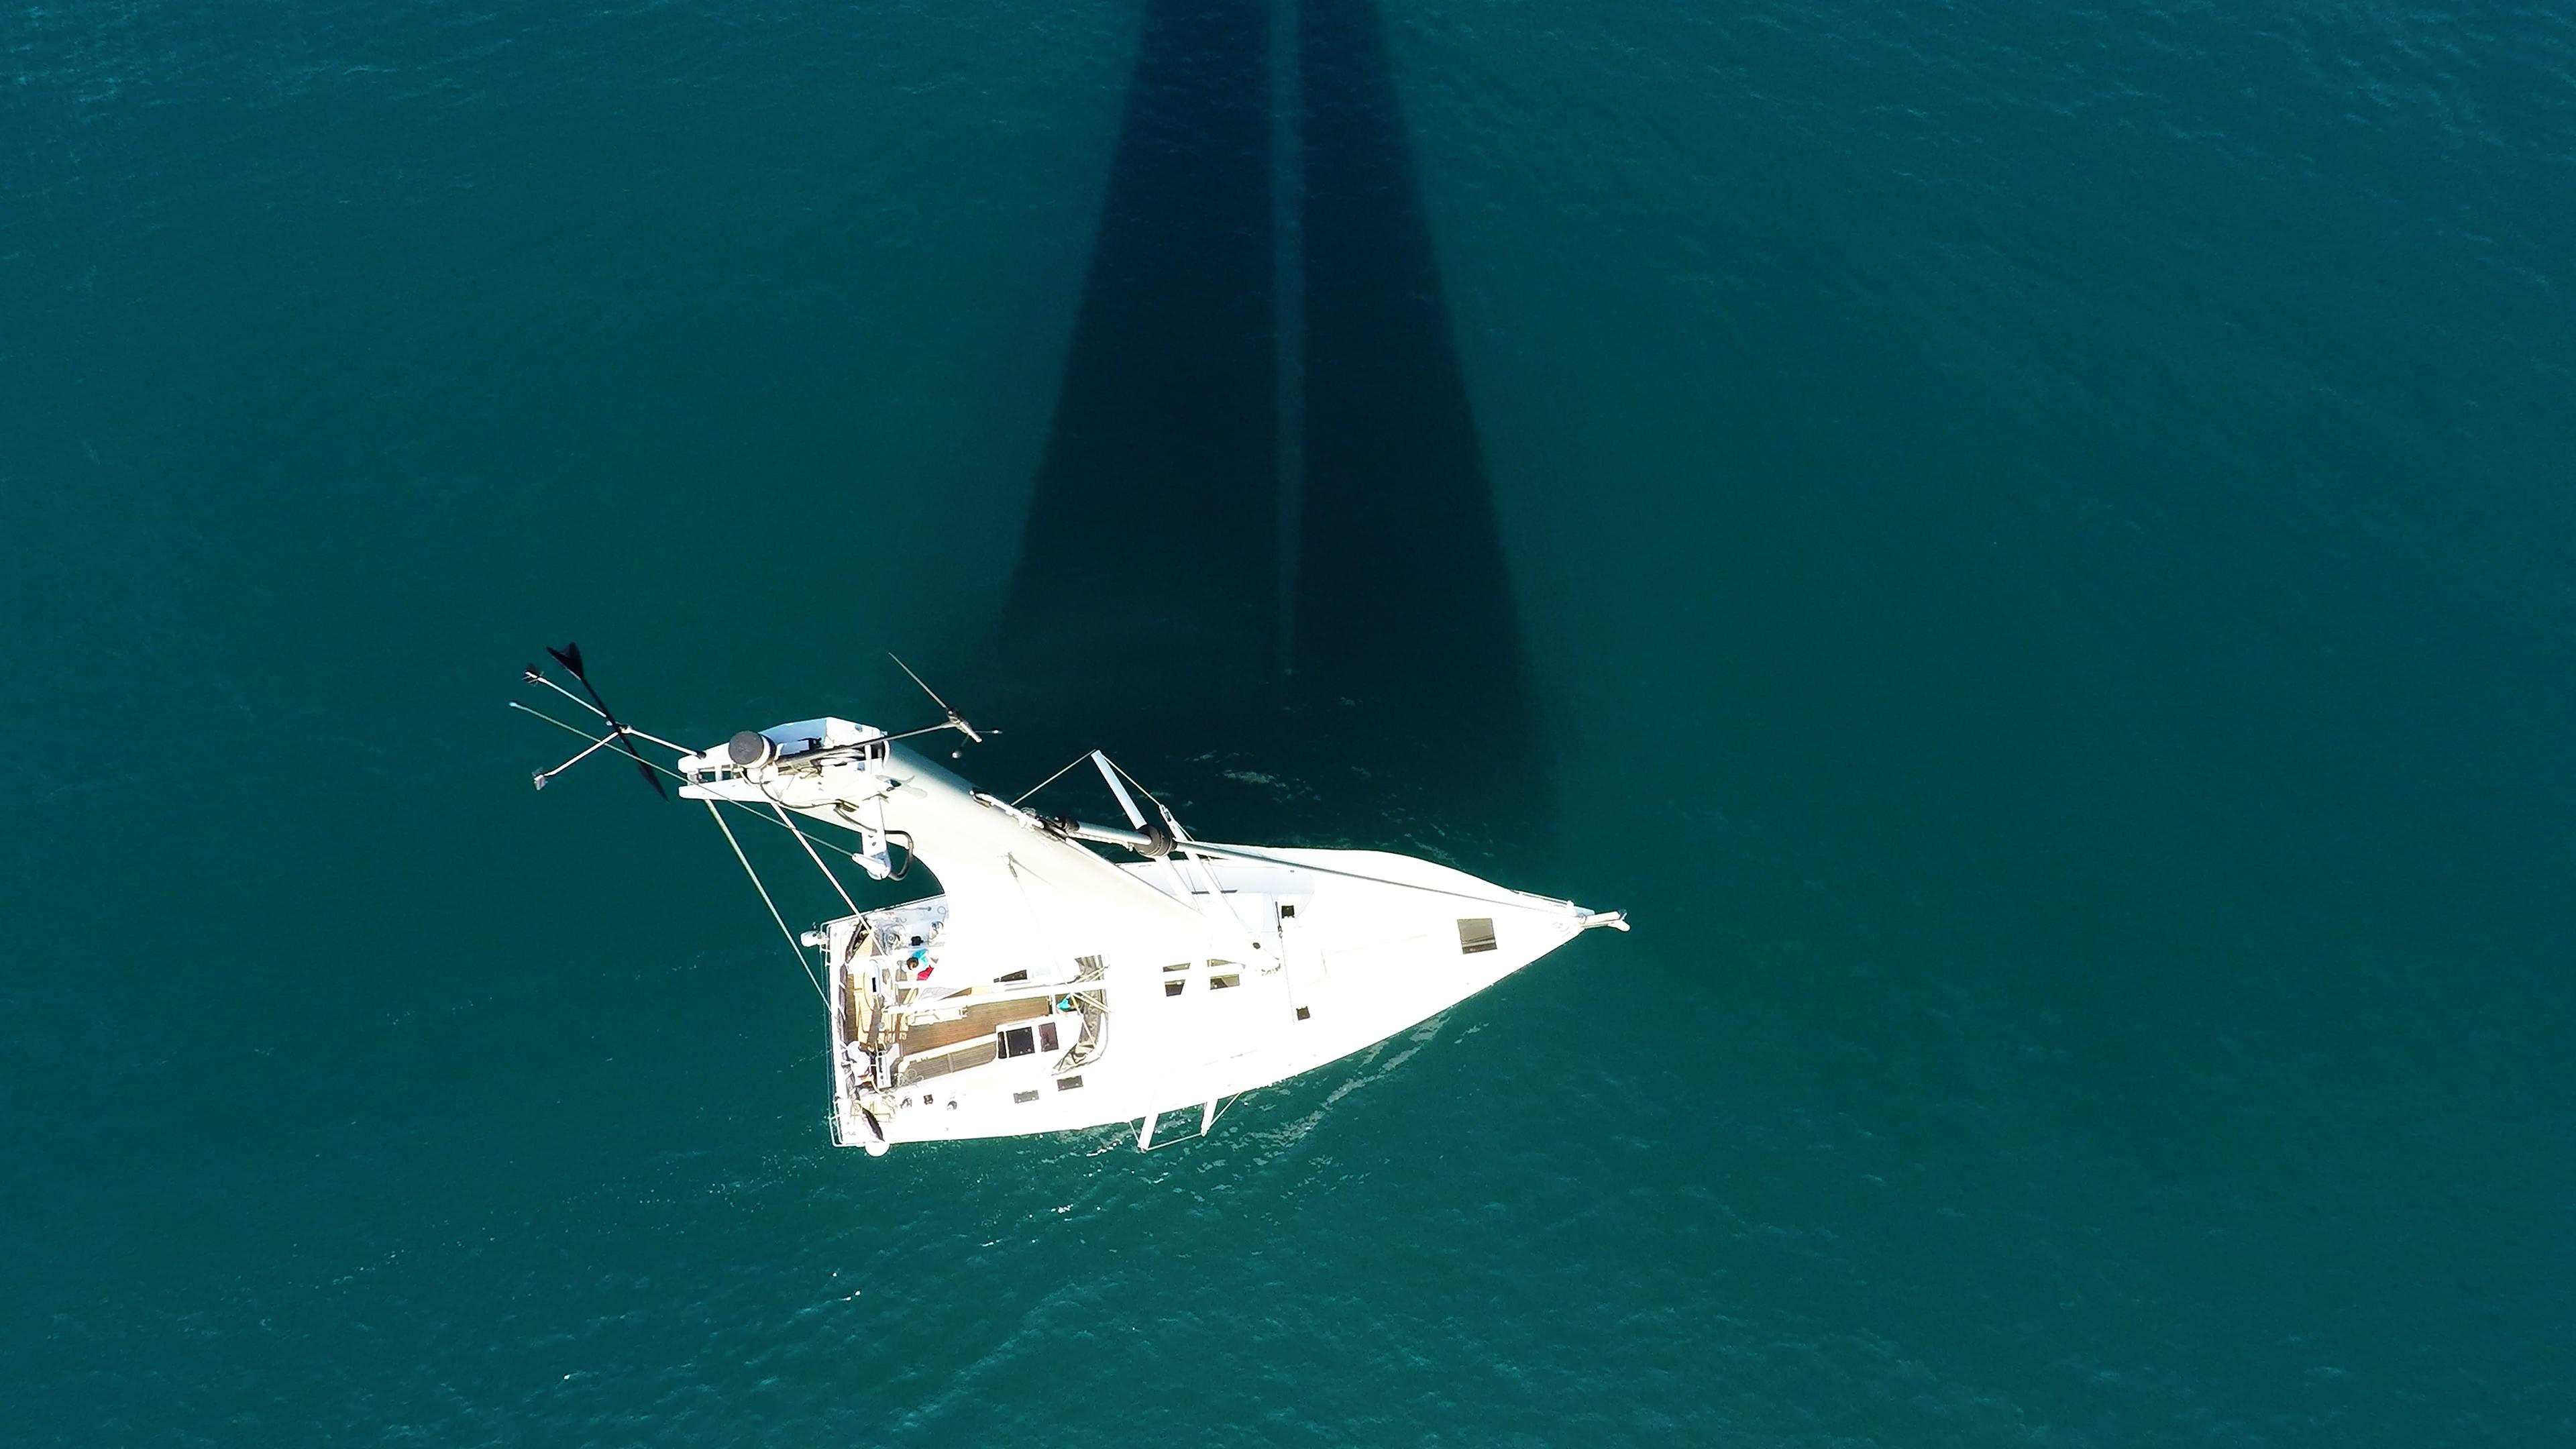 barcha a vela cima dell'albero nadir vista verticalee barca a vela ponte per yacht albero sartiame